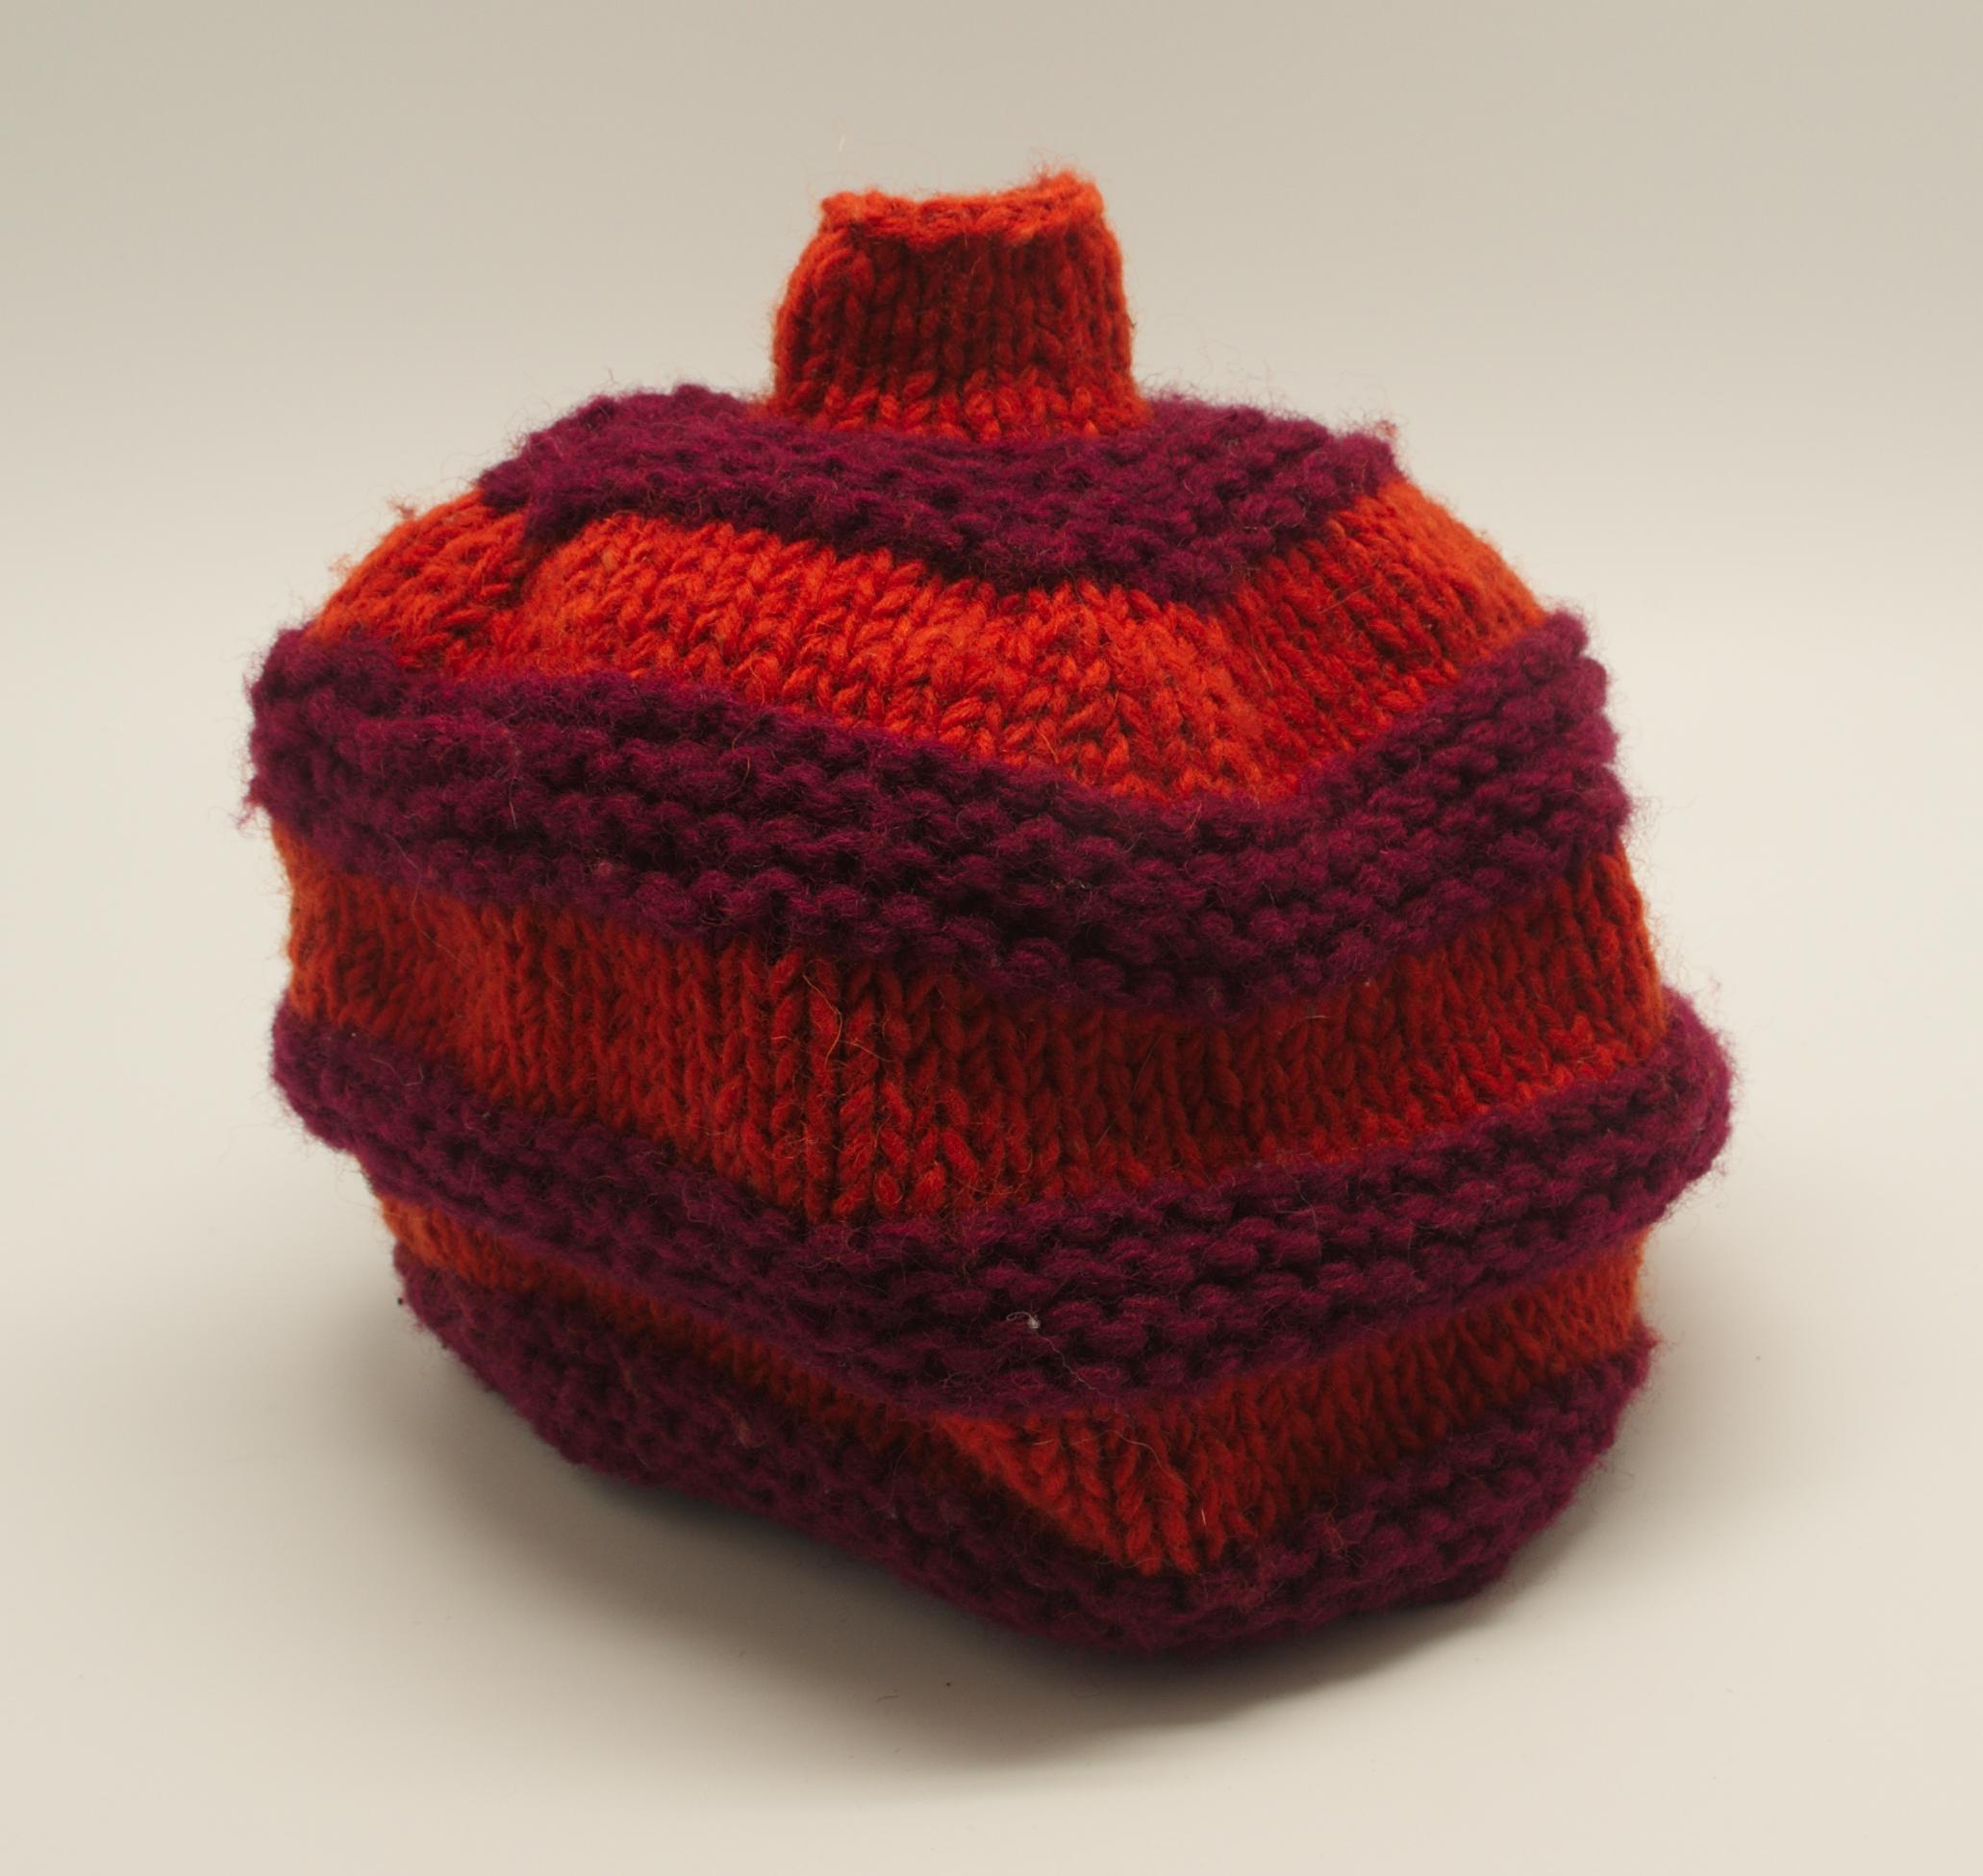 file bonnet rouge et wikimedia commons. Black Bedroom Furniture Sets. Home Design Ideas